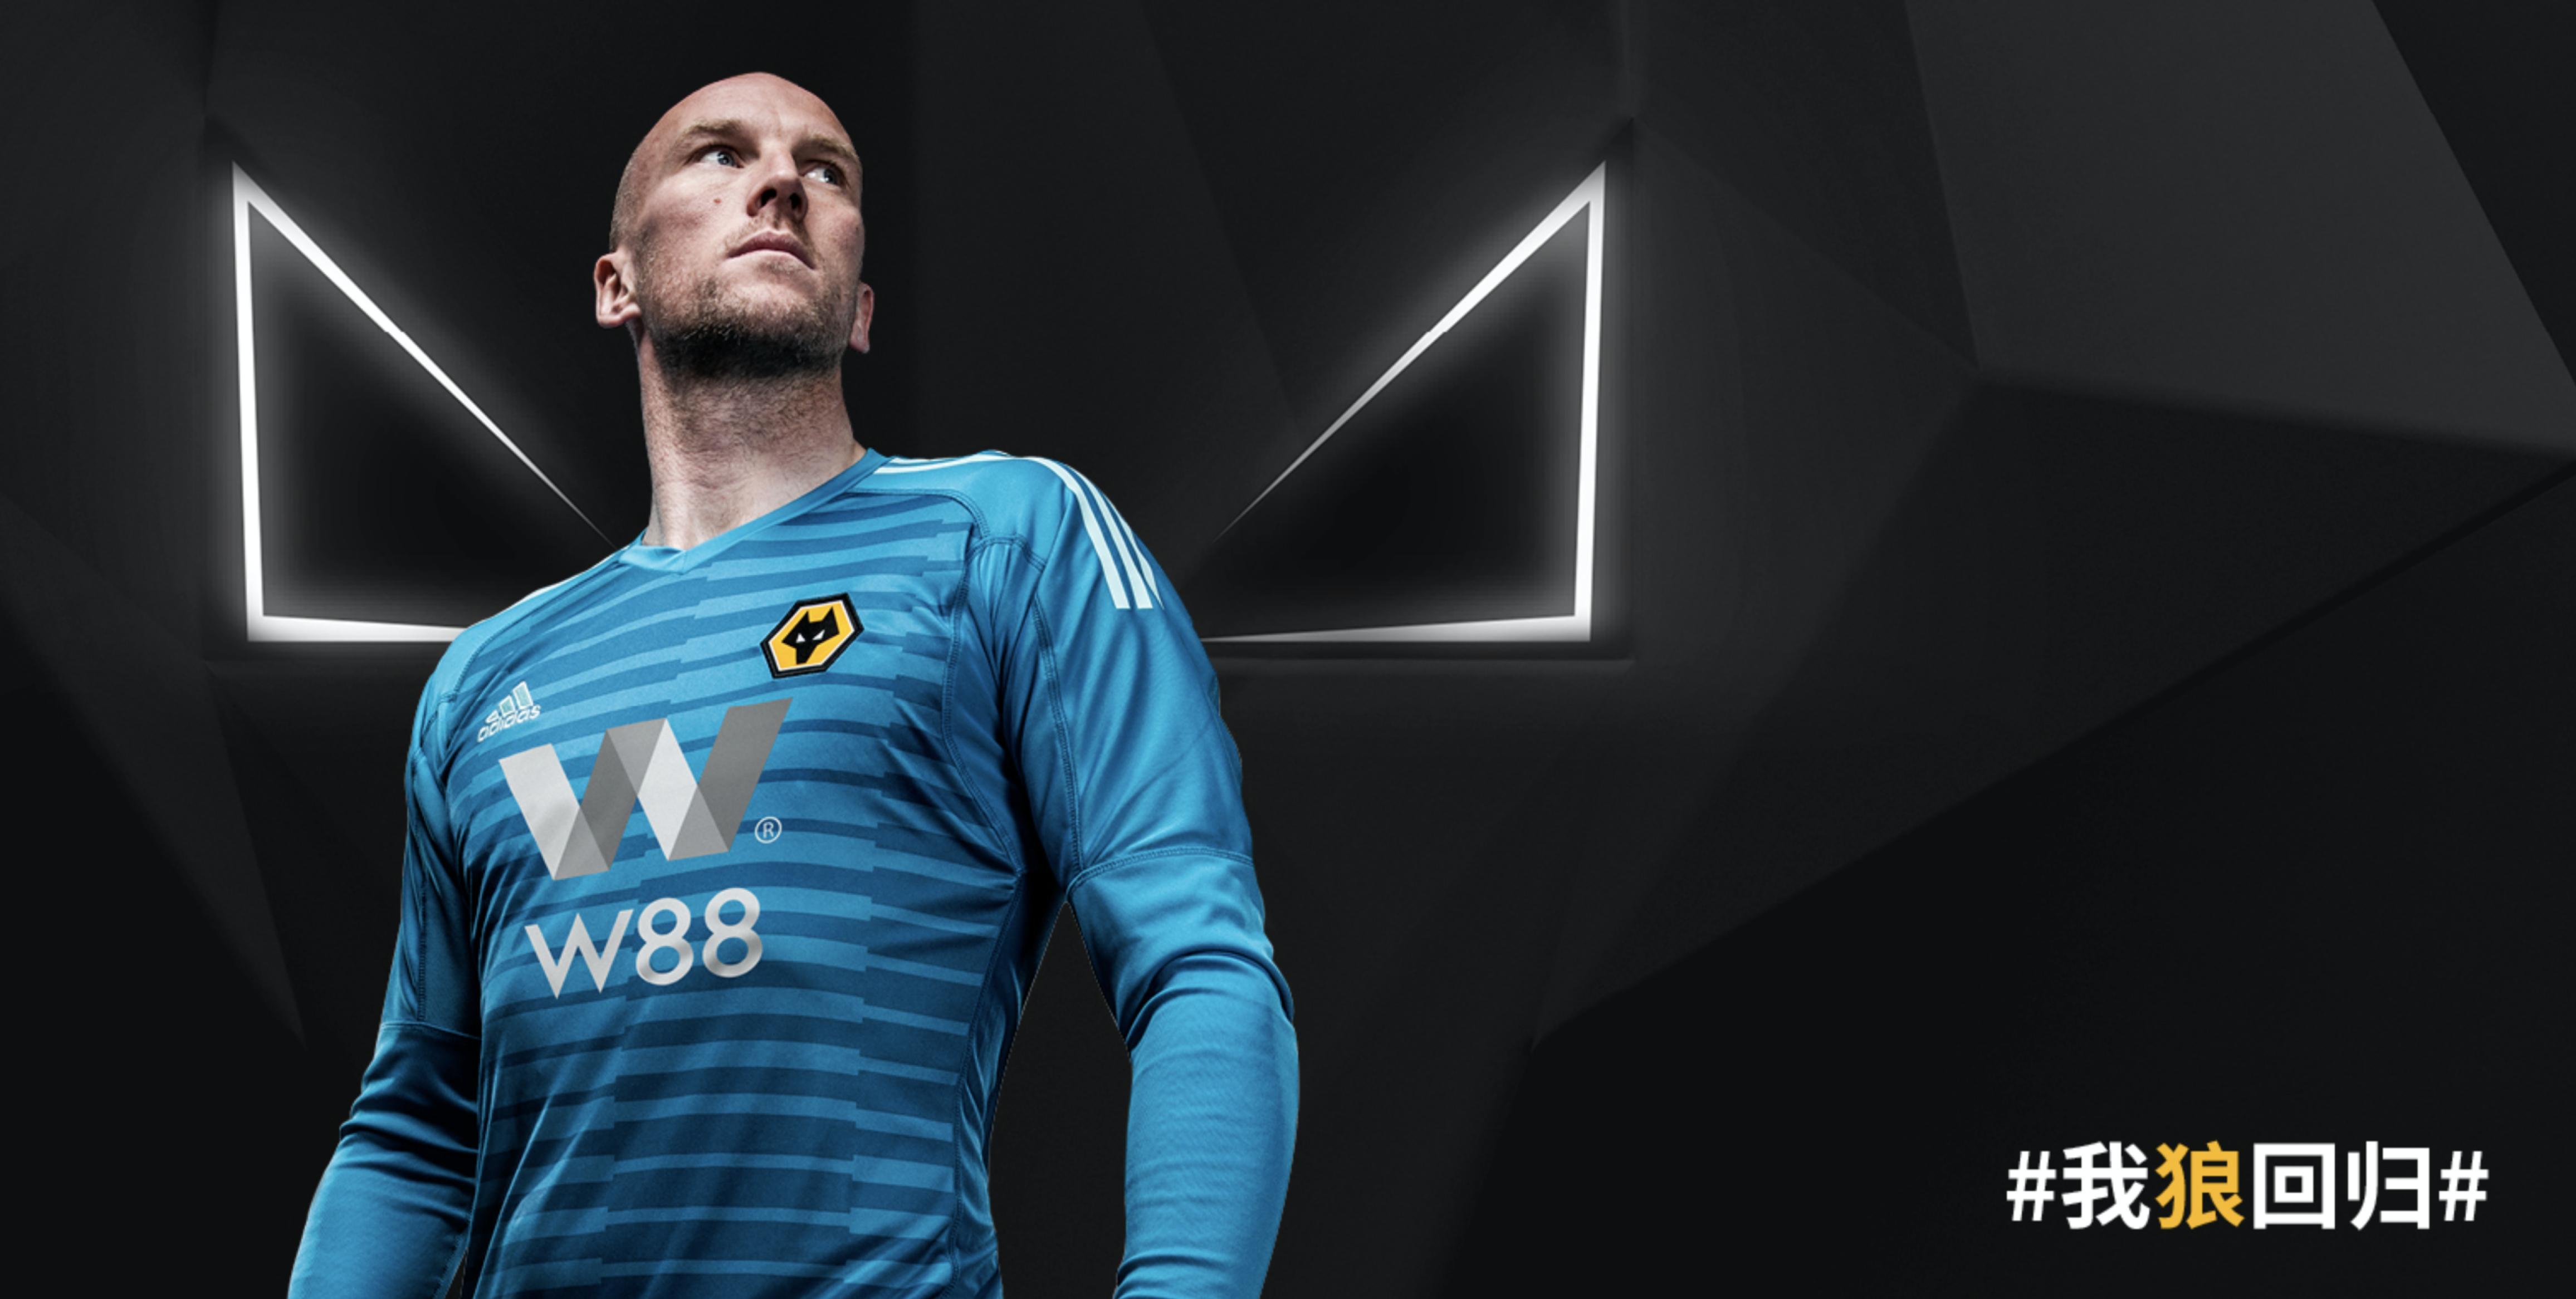 Wolves kit launch 18/19